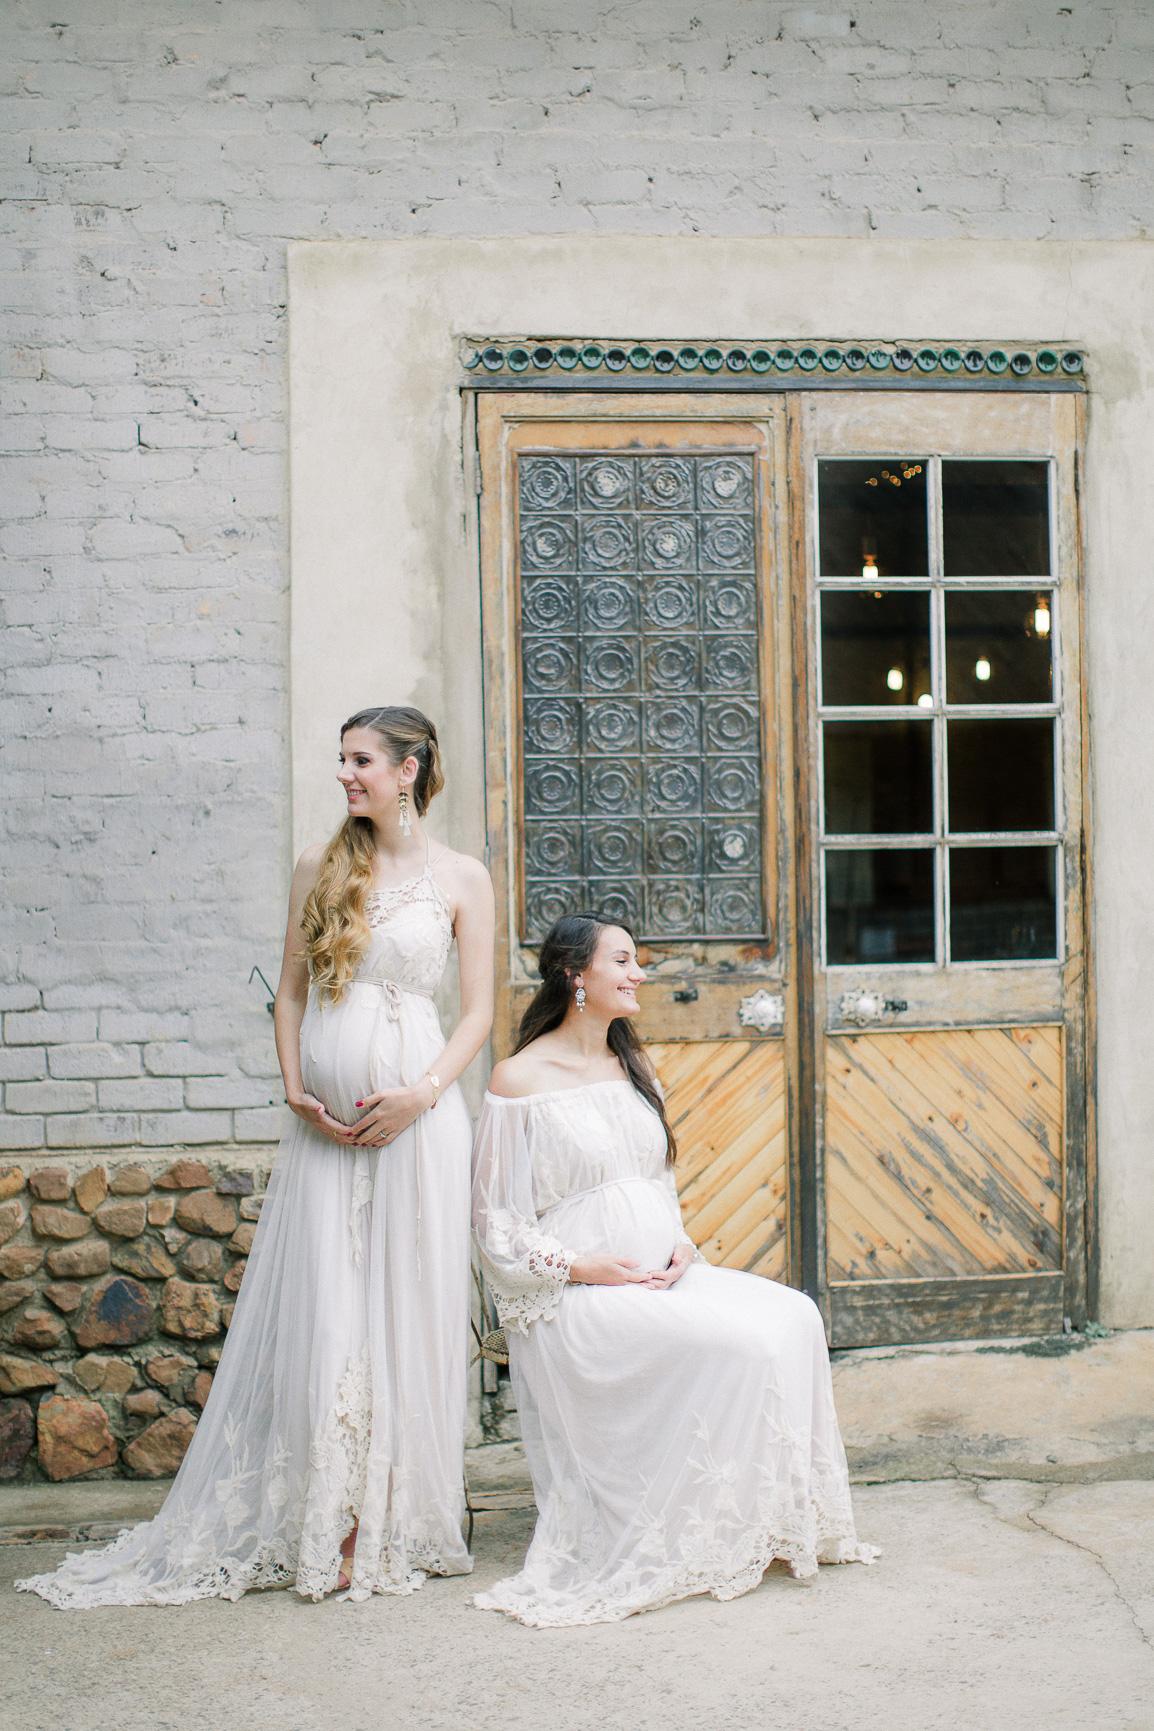 johannesburg fine art wedding photographer maternity pretoria019.jpg